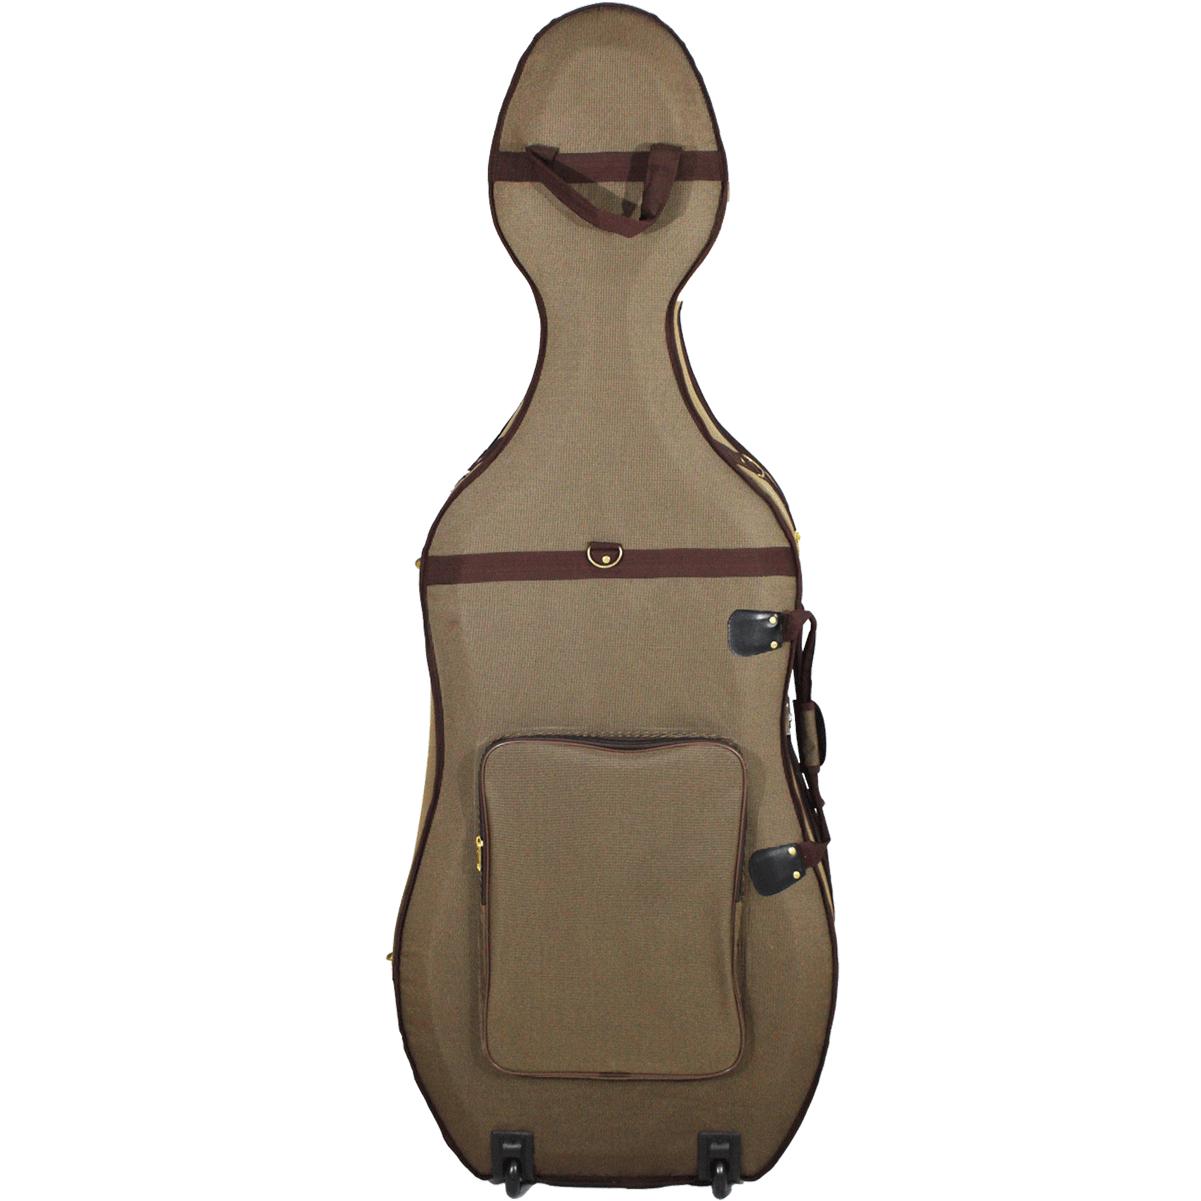 Estojo Case Cello Violoncelo 4/4 Orquezz Térmico Luxo marrom